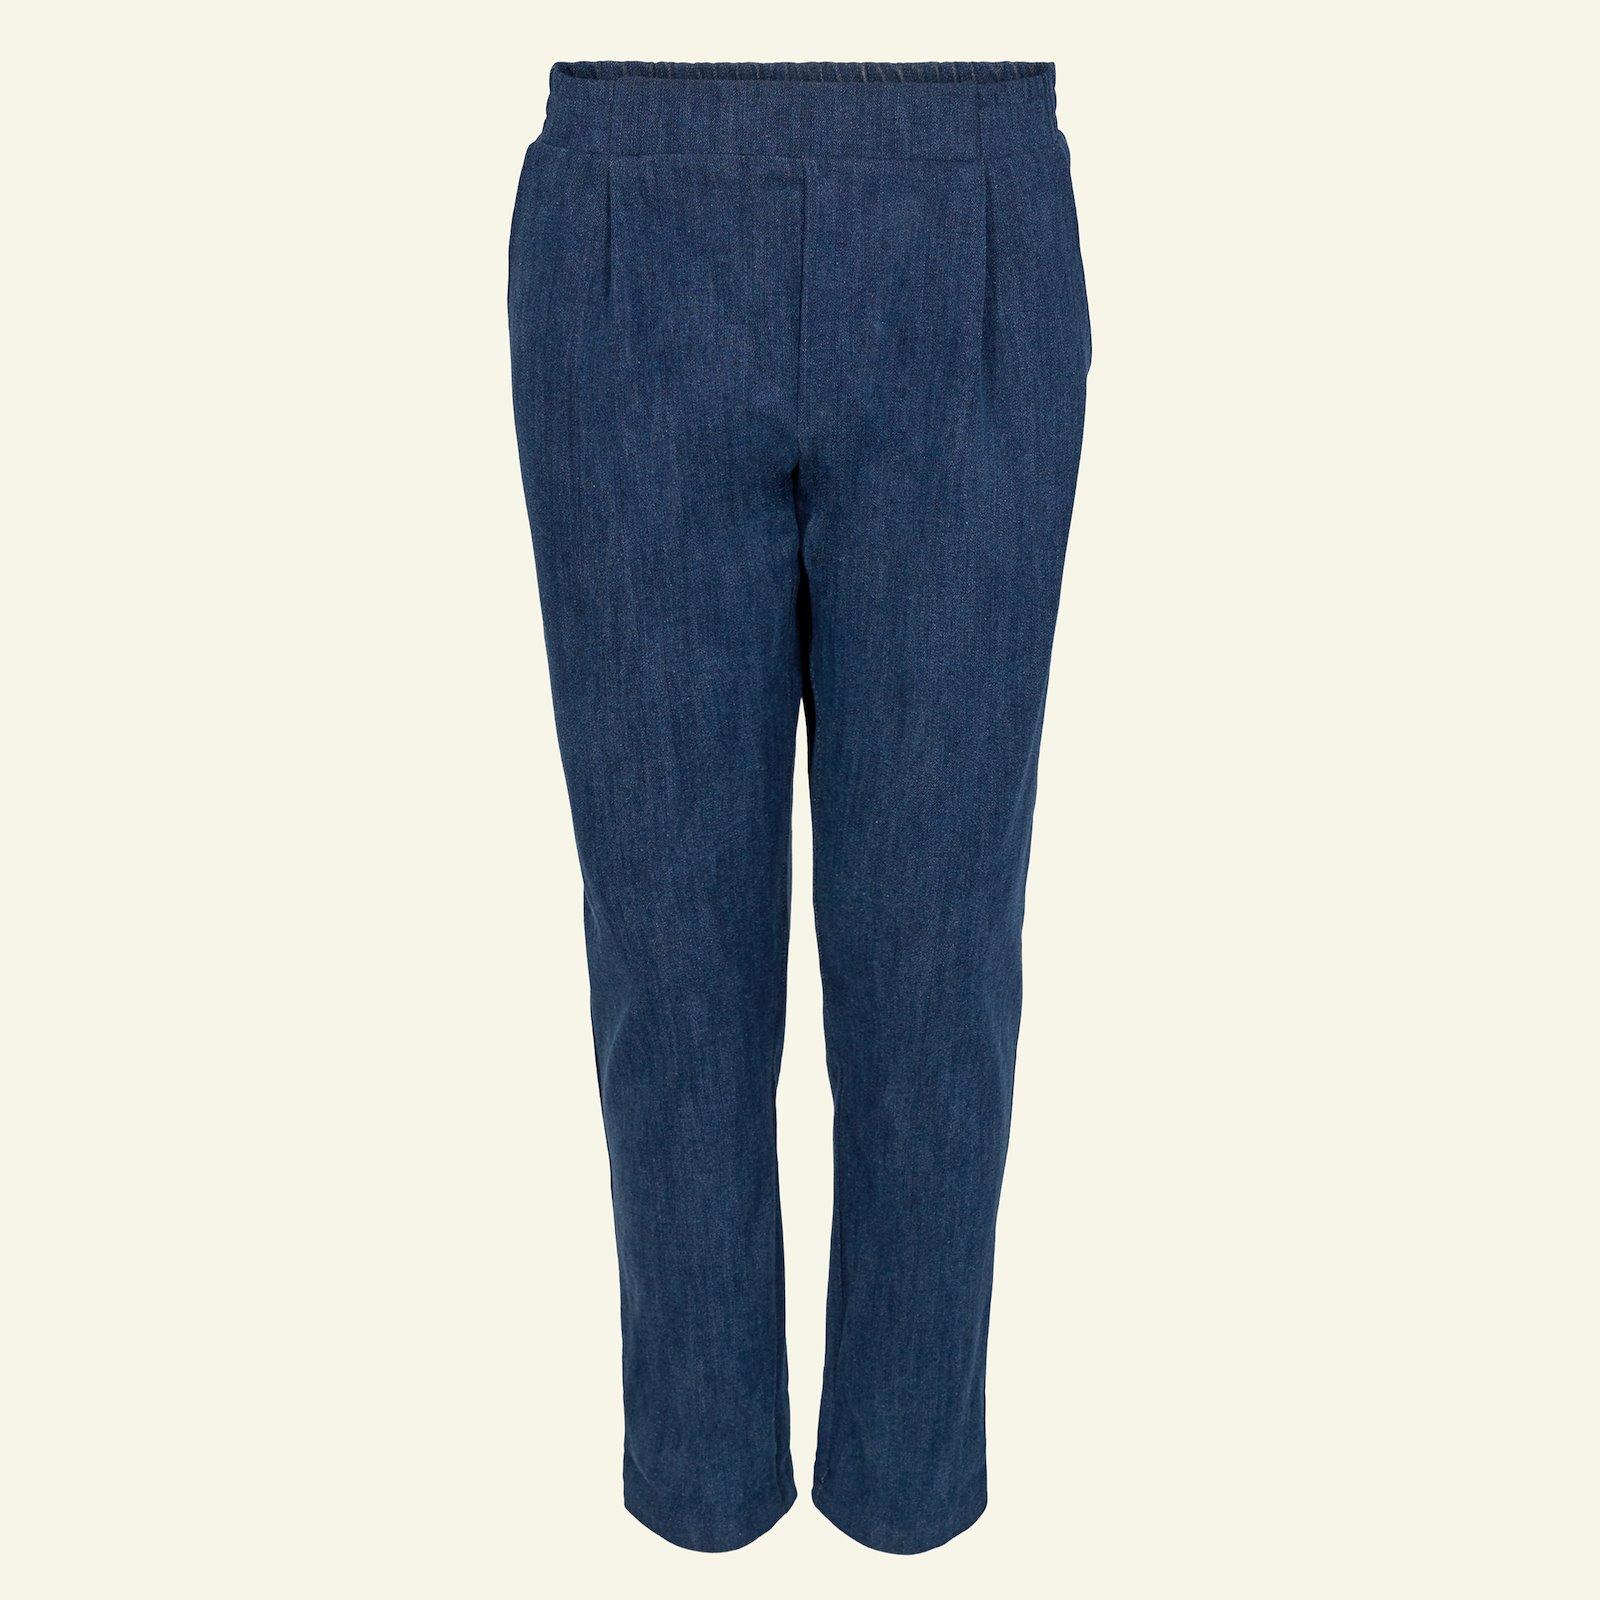 Chino pants, 116/6y p60033_460851_sskit